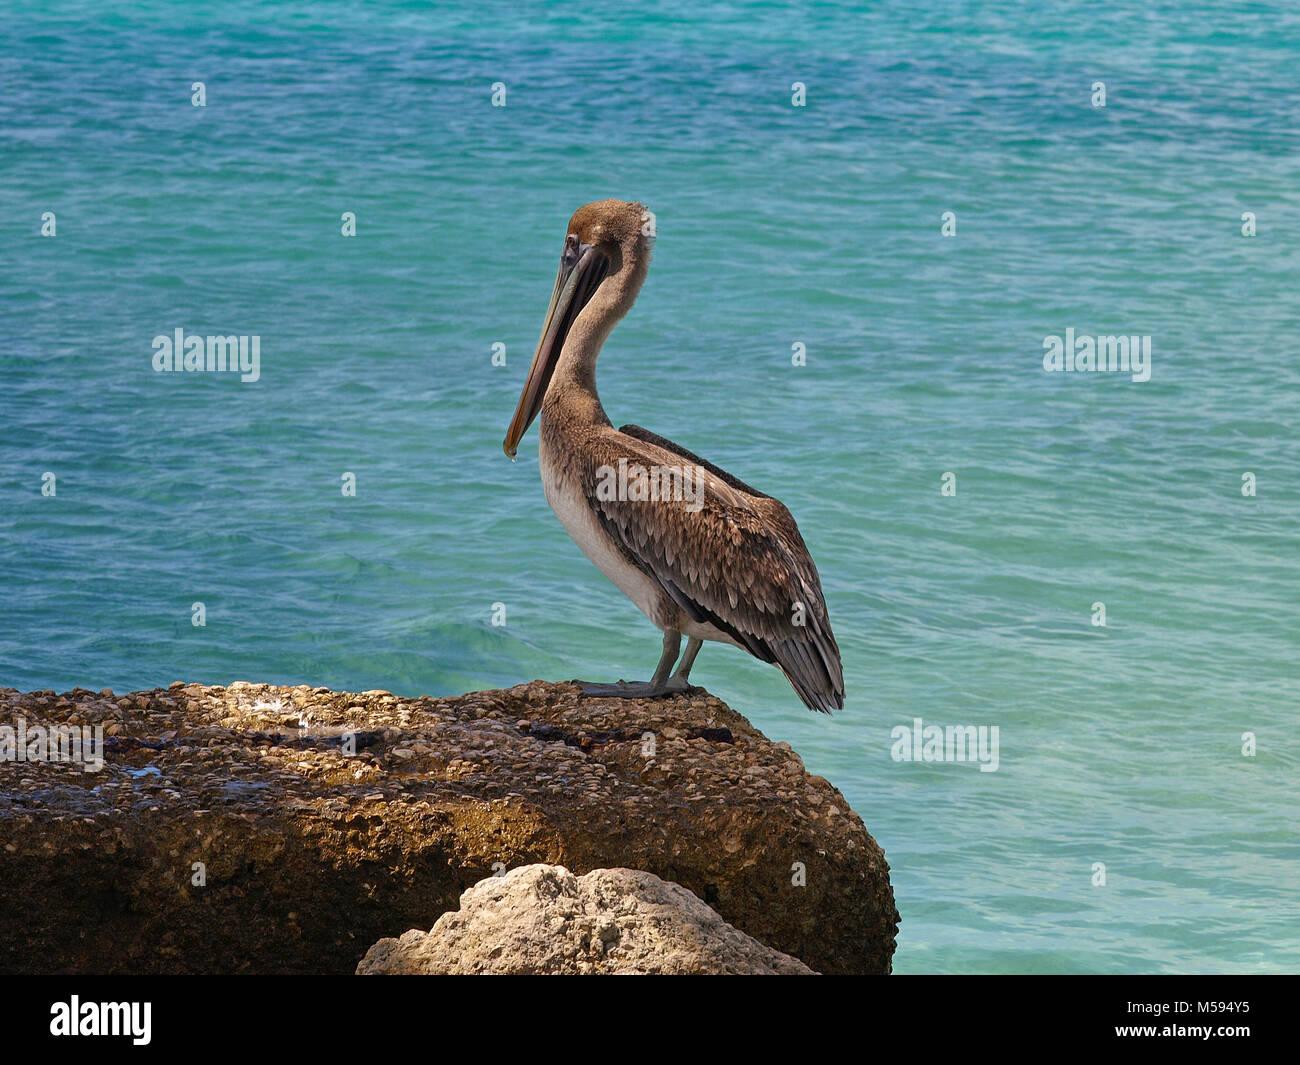 Brown pelican at Bonaire Stock Photo